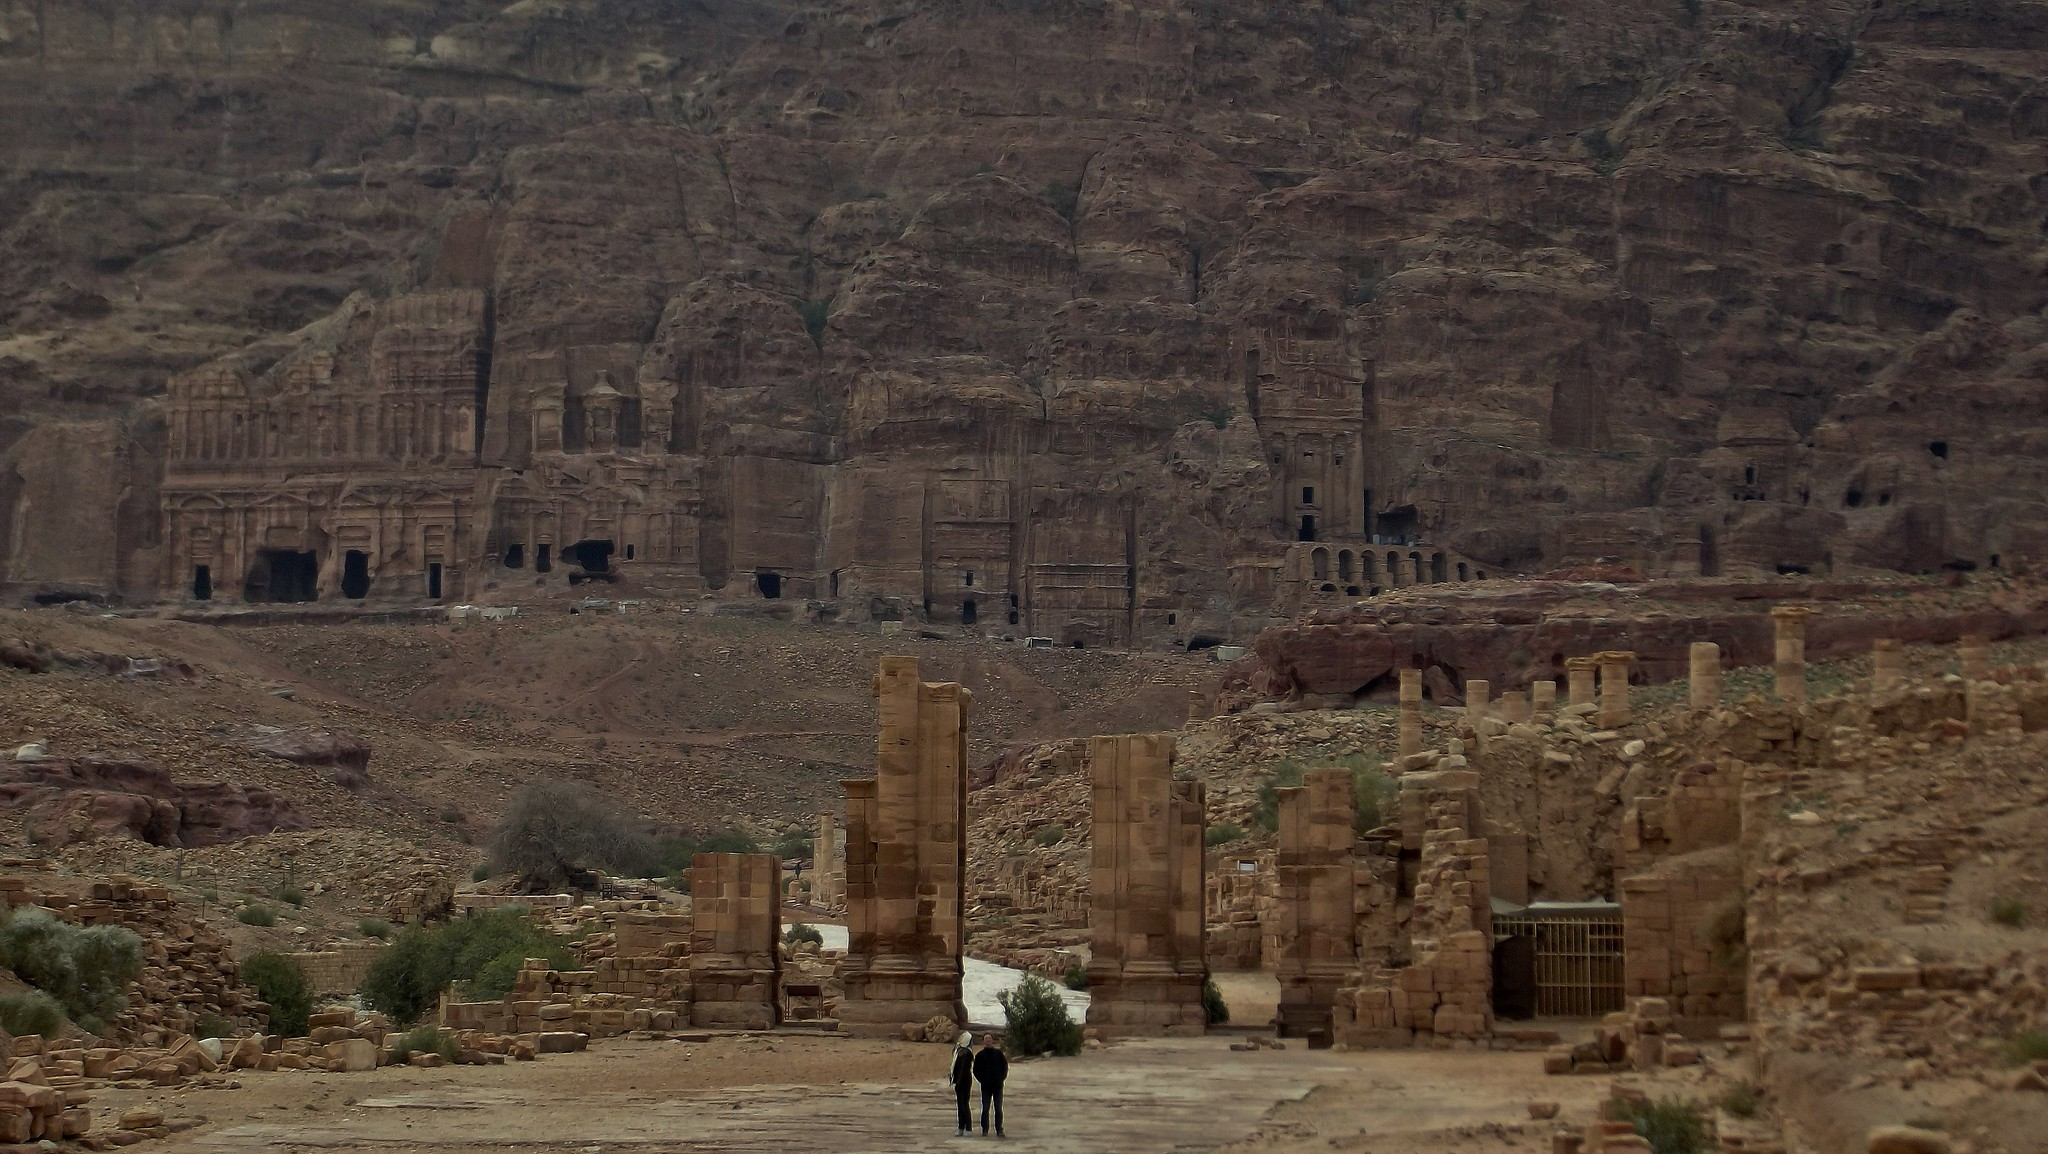 The Temenos Gate and the Royal Tombs at Petra, Jordan - March 2012